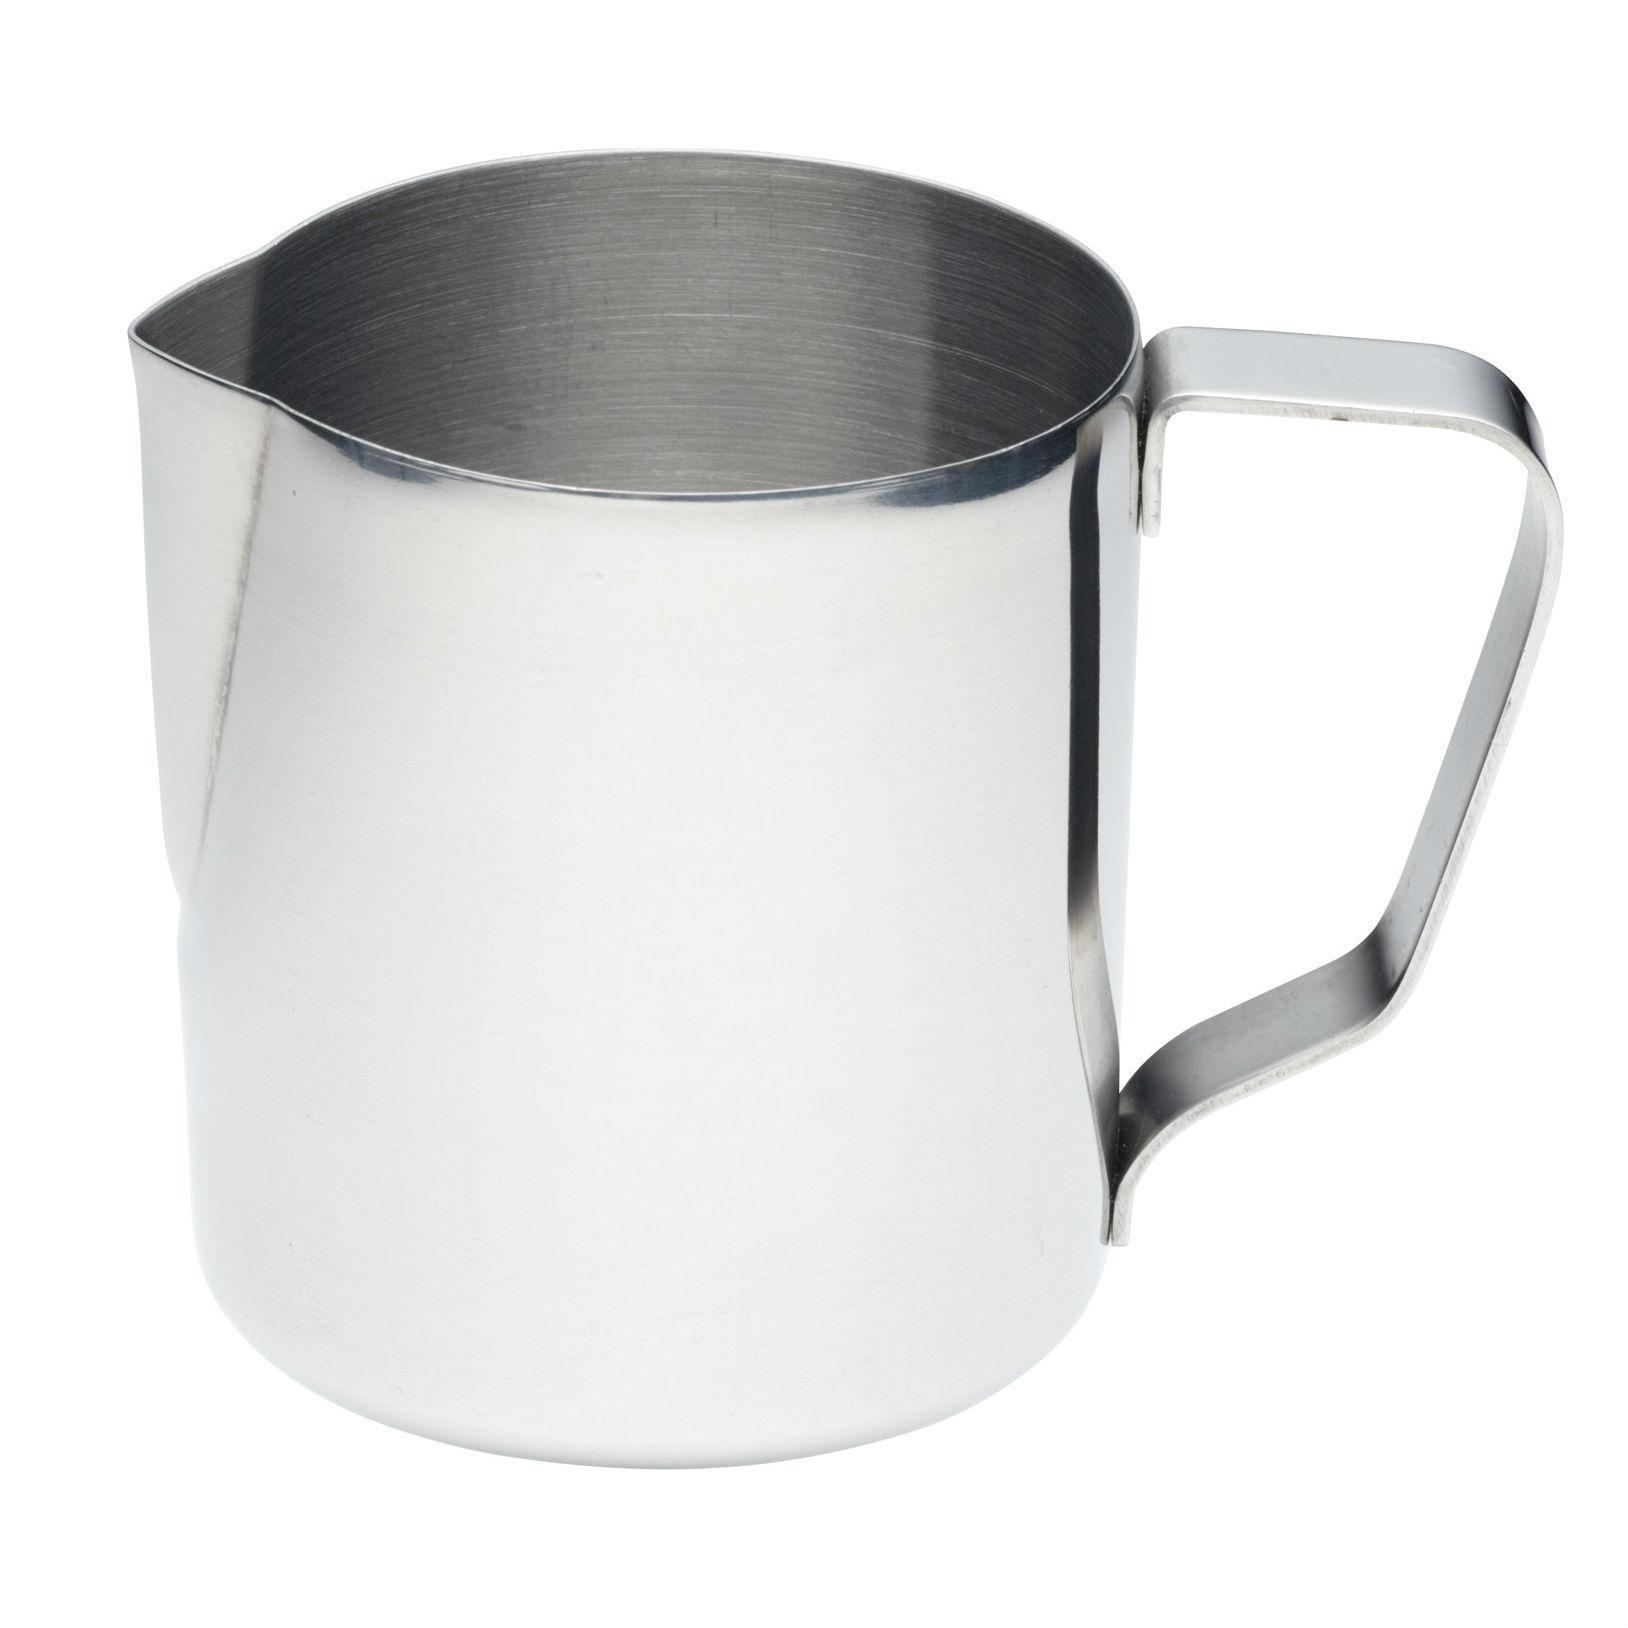 kitchencraft medium stainless steel milk jug frothing. Black Bedroom Furniture Sets. Home Design Ideas